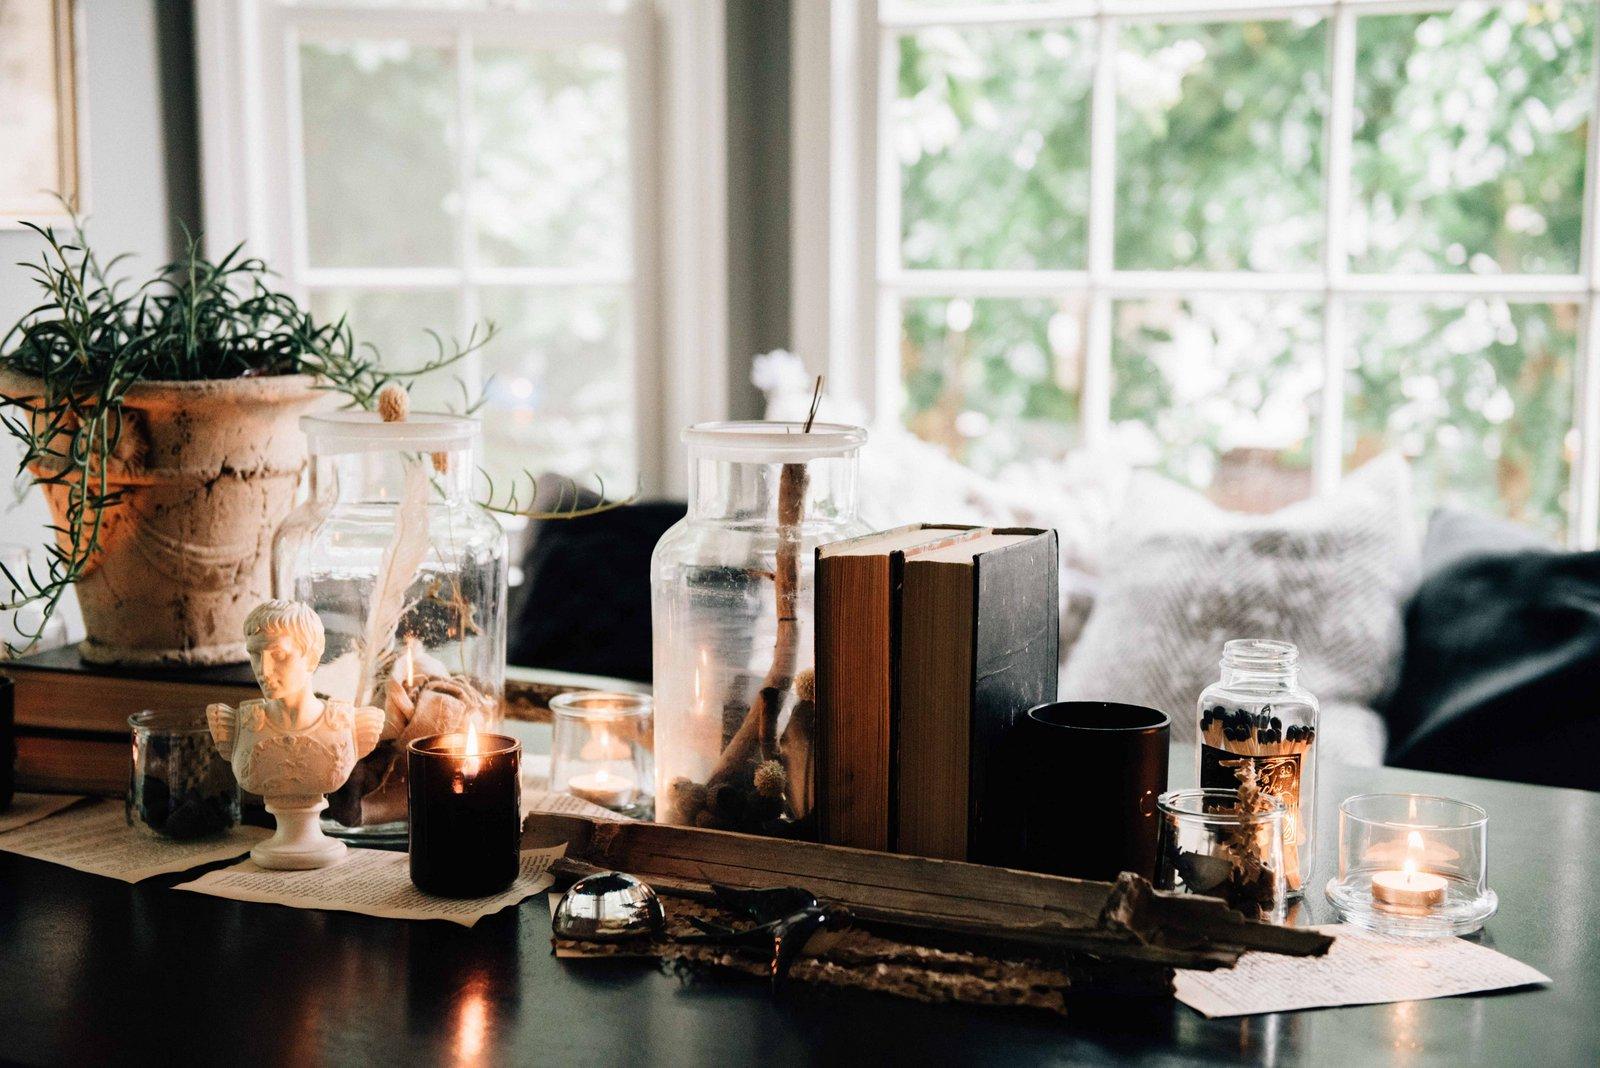 DIY Fall Jars - Time to Forage!